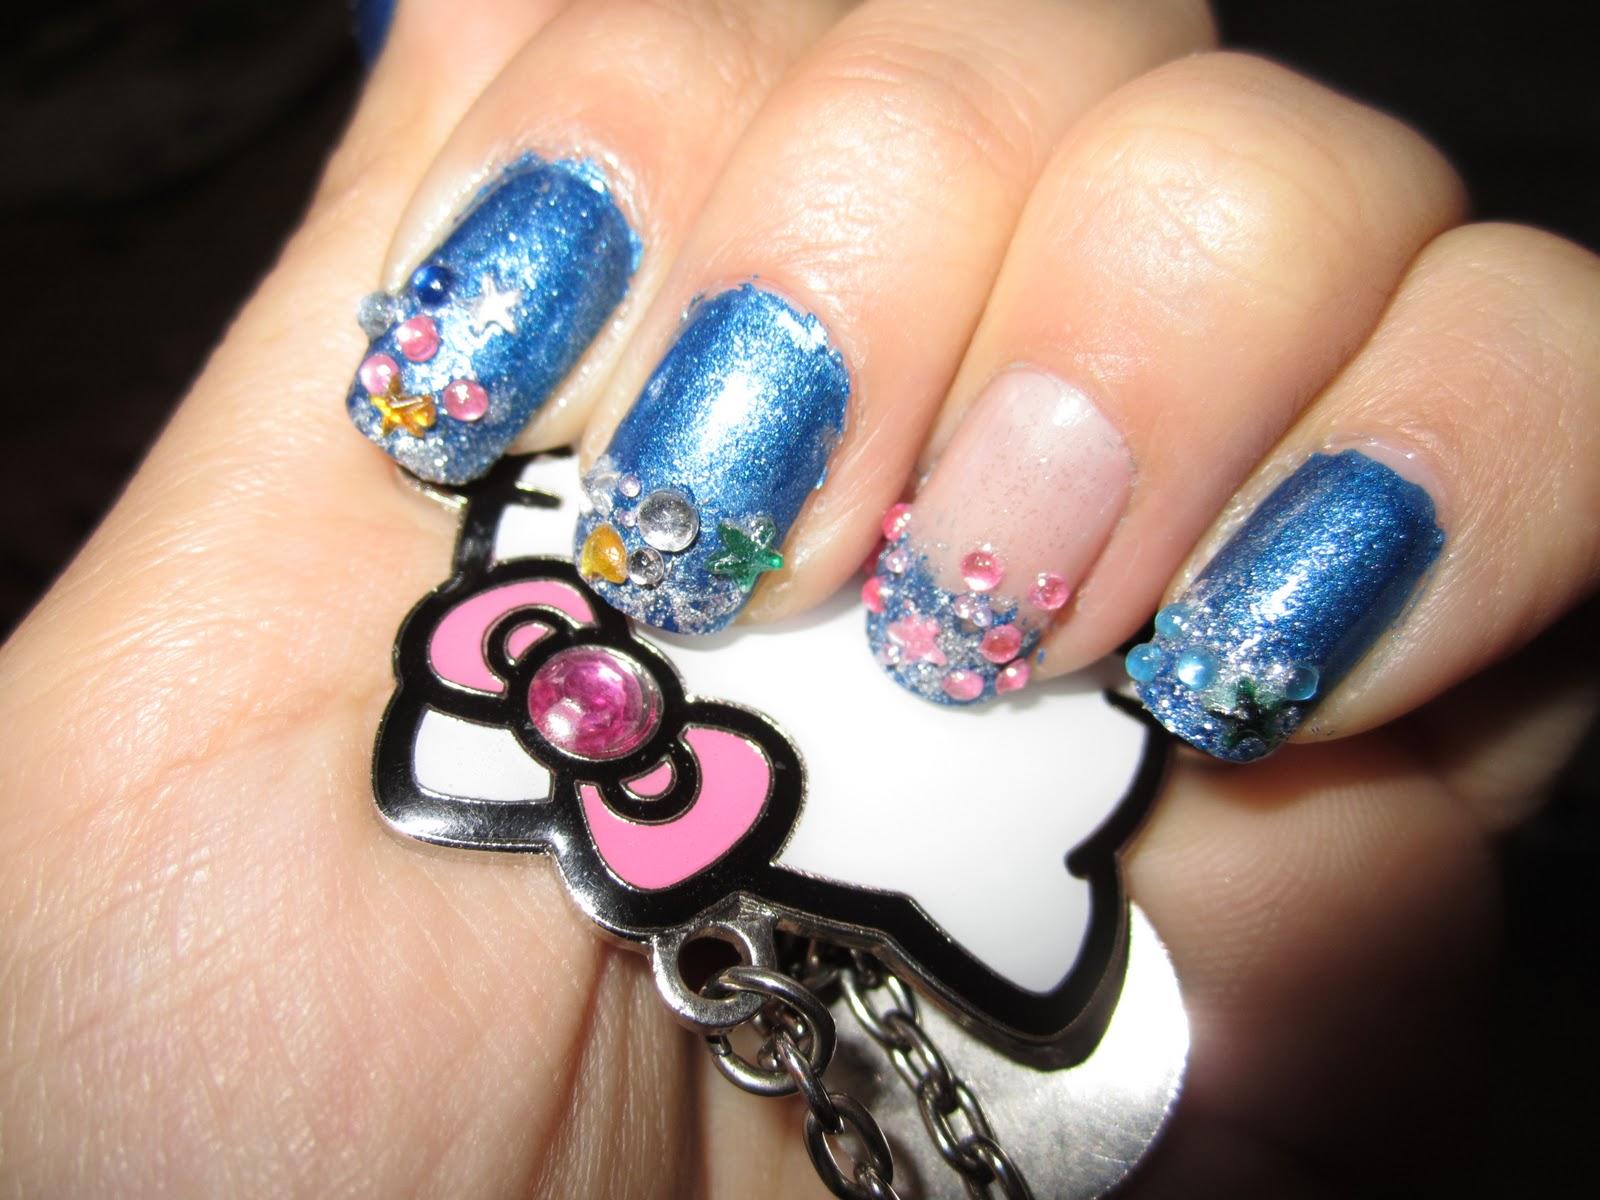 ♥: Pink and Black Zebra nail design / Blue rhinestones nail design